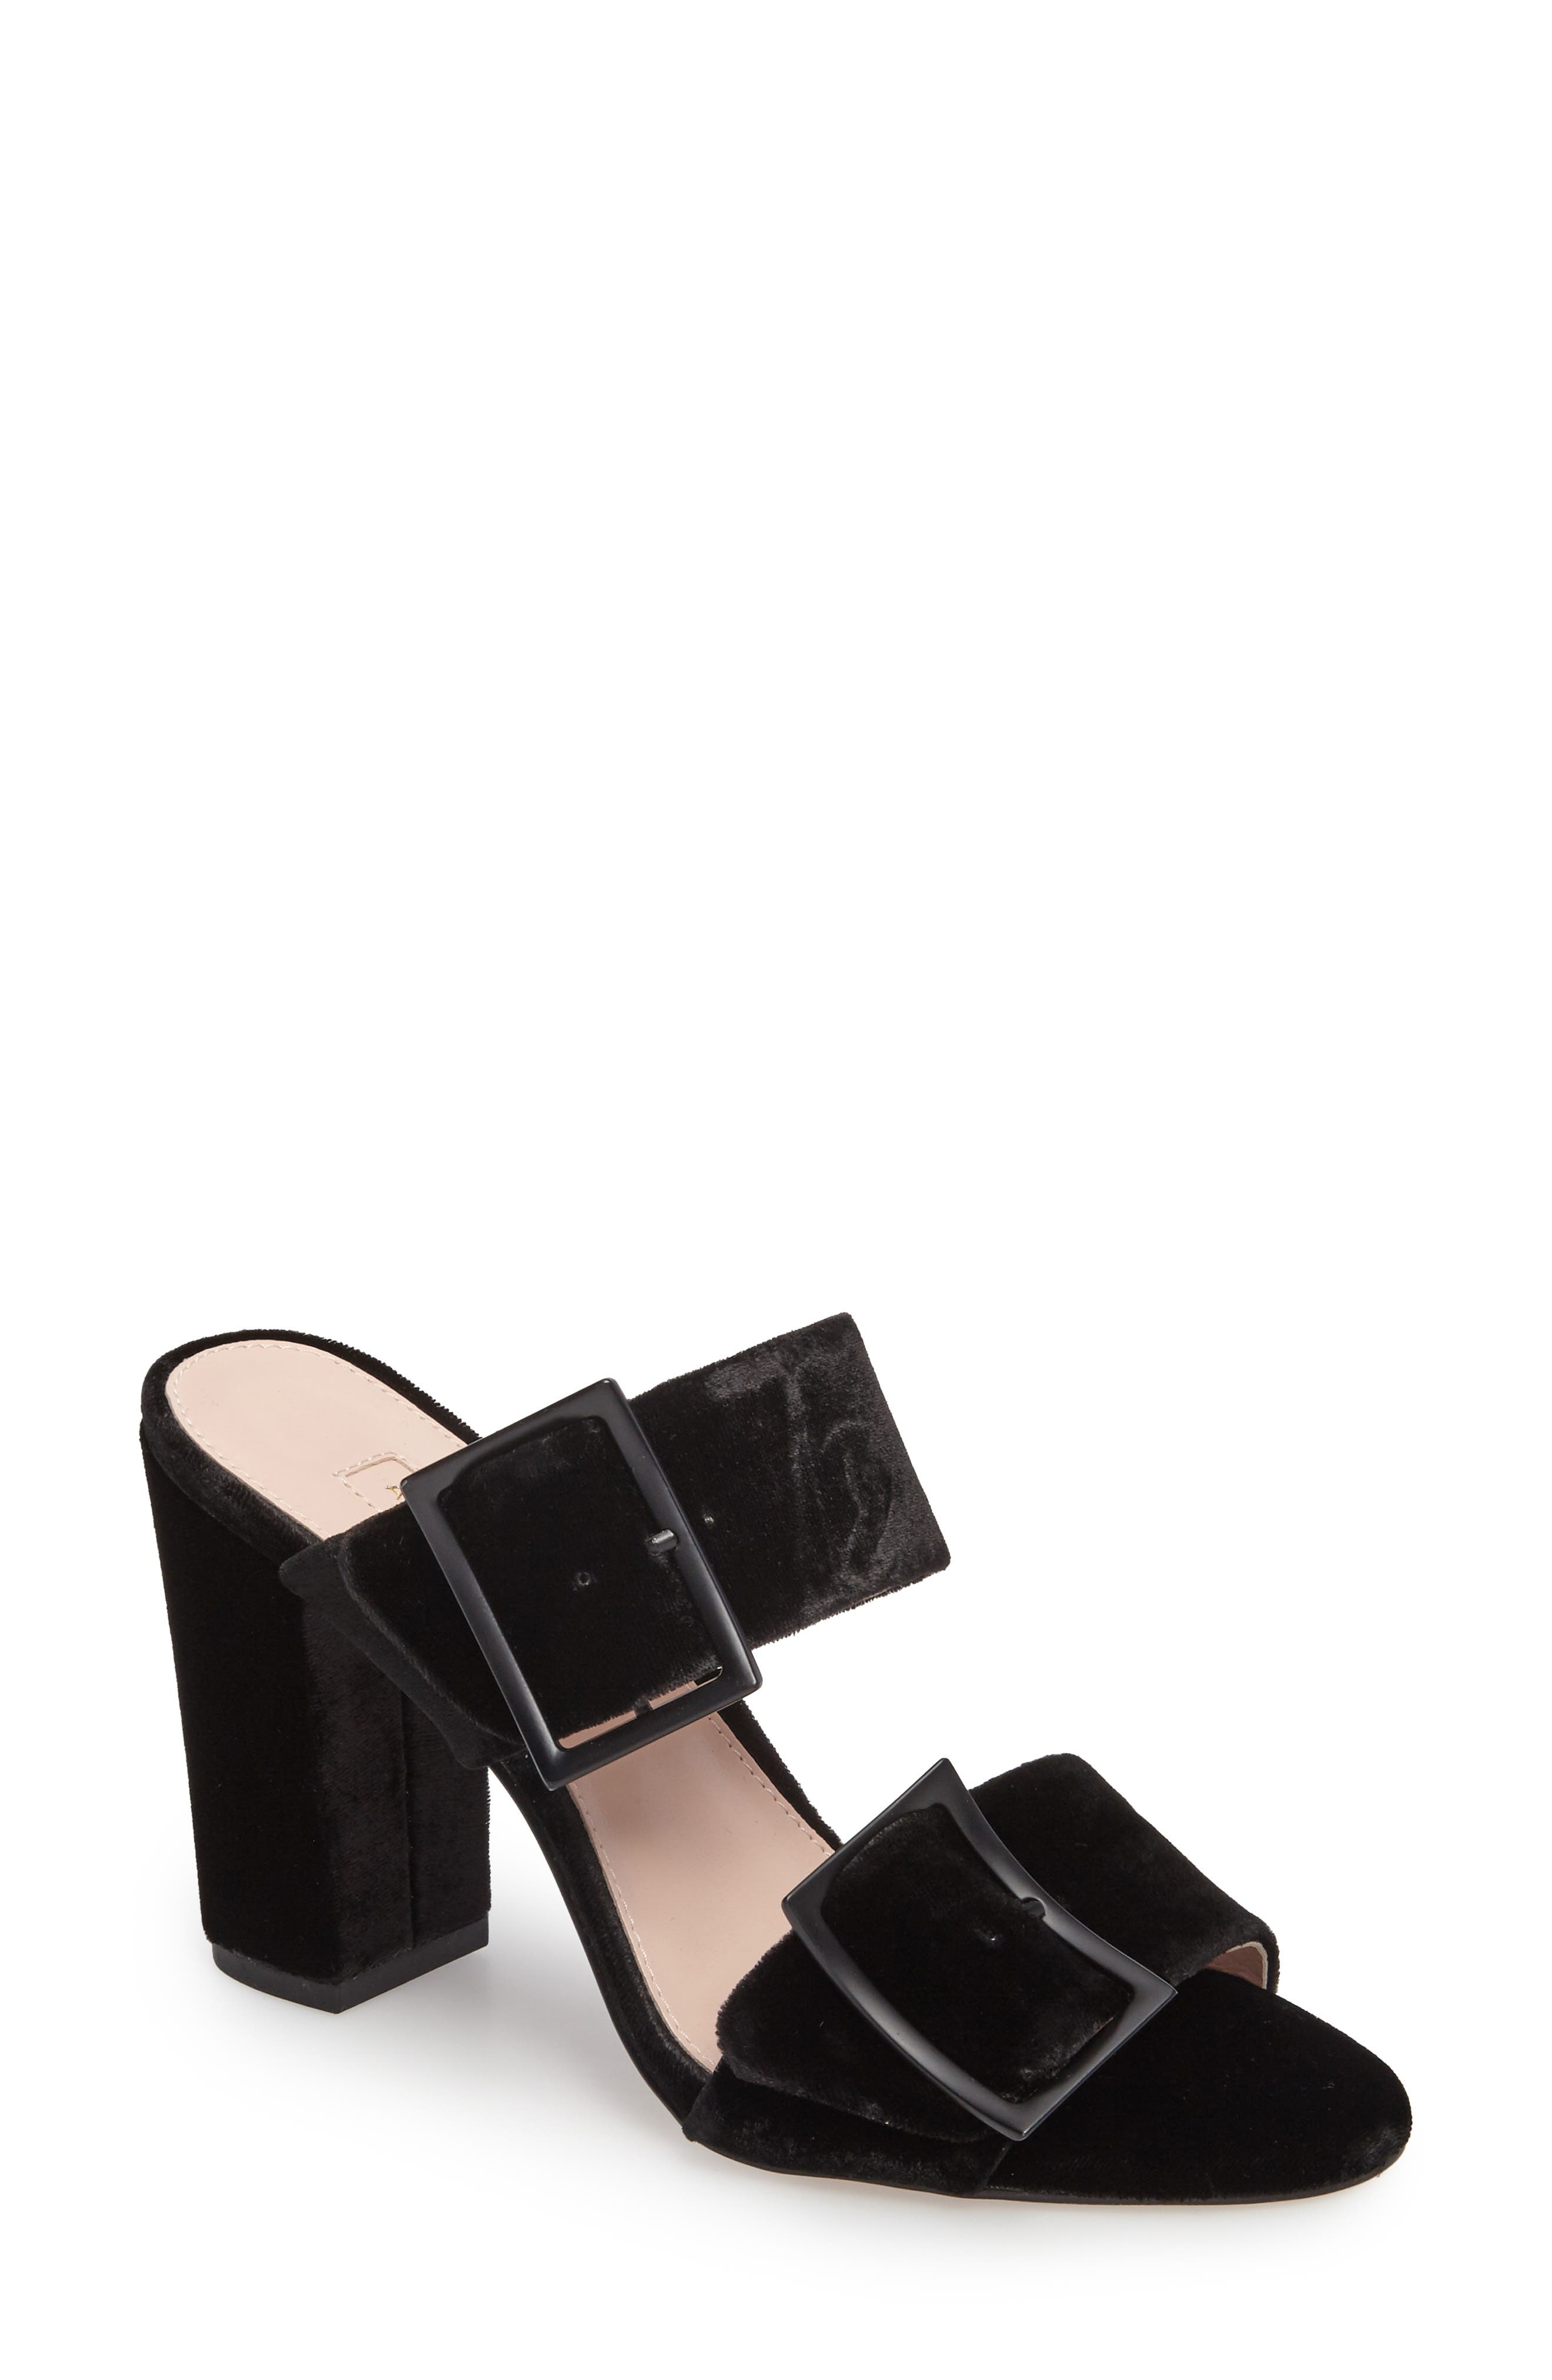 Millie Buckle Strap Sandal,                             Main thumbnail 1, color,                             Black Fabric